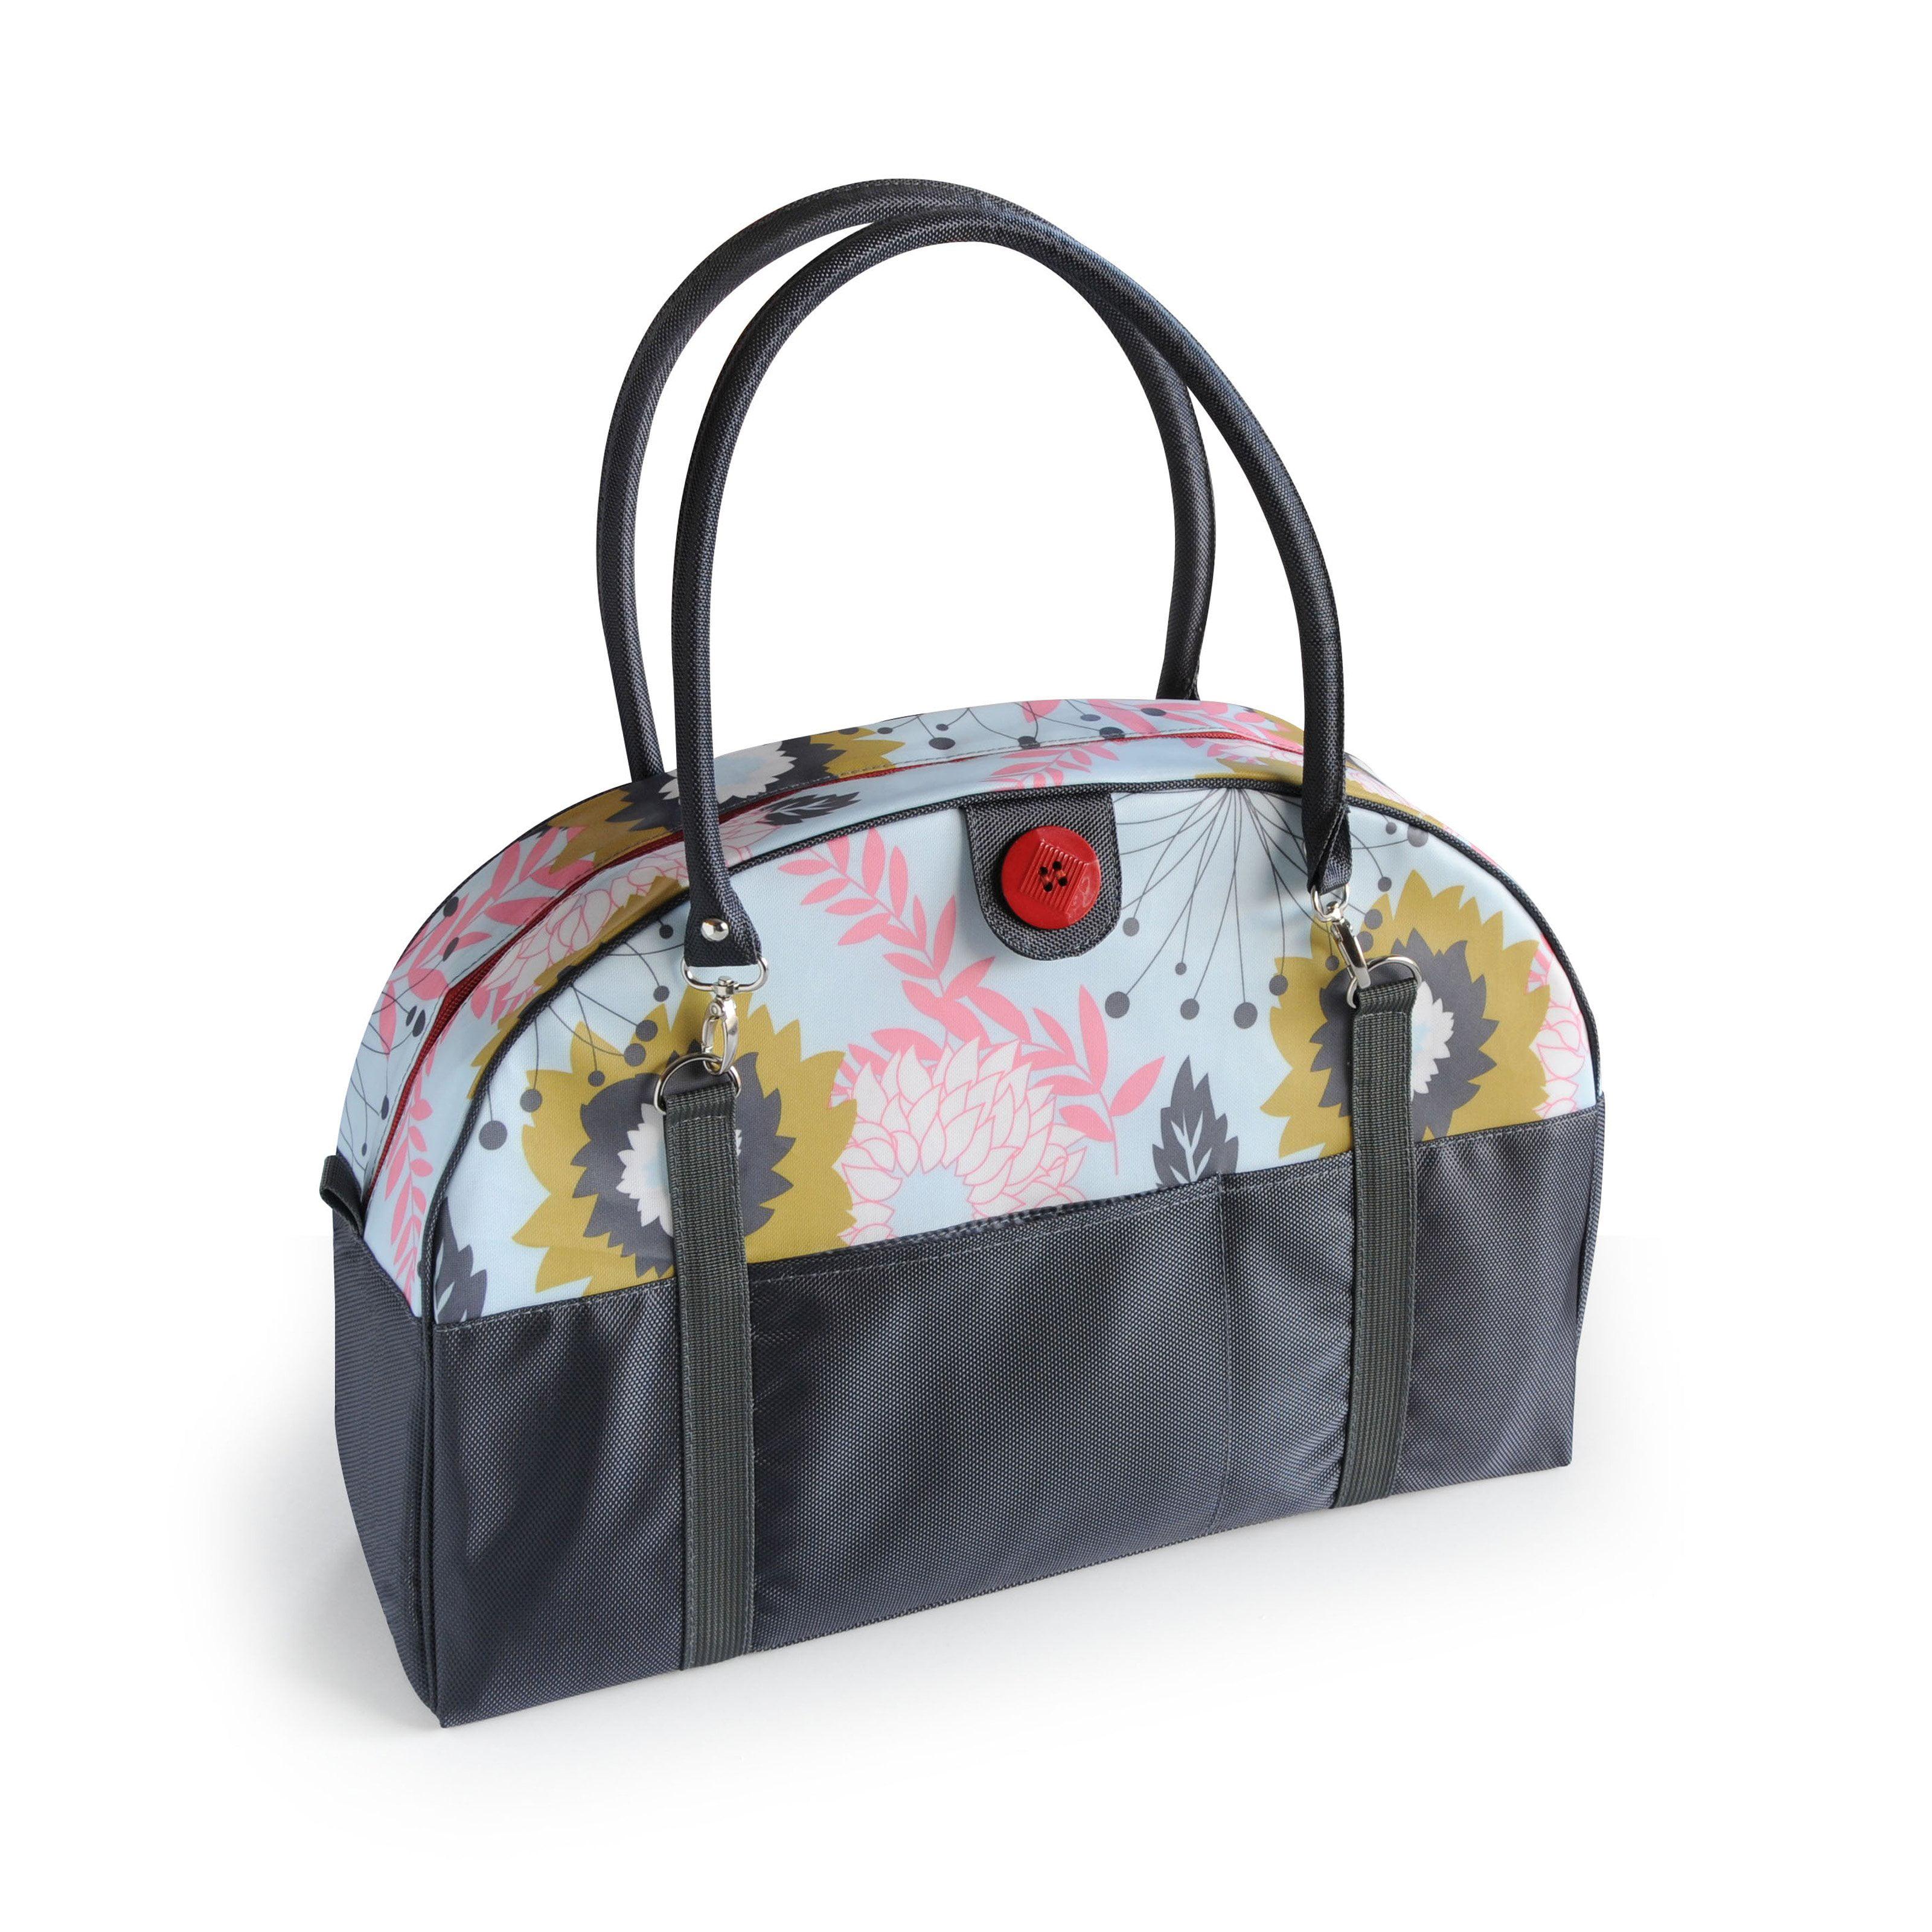 Image of 2 Red Hens Coop Carry-All Diaper Bag - Pink Lemonade